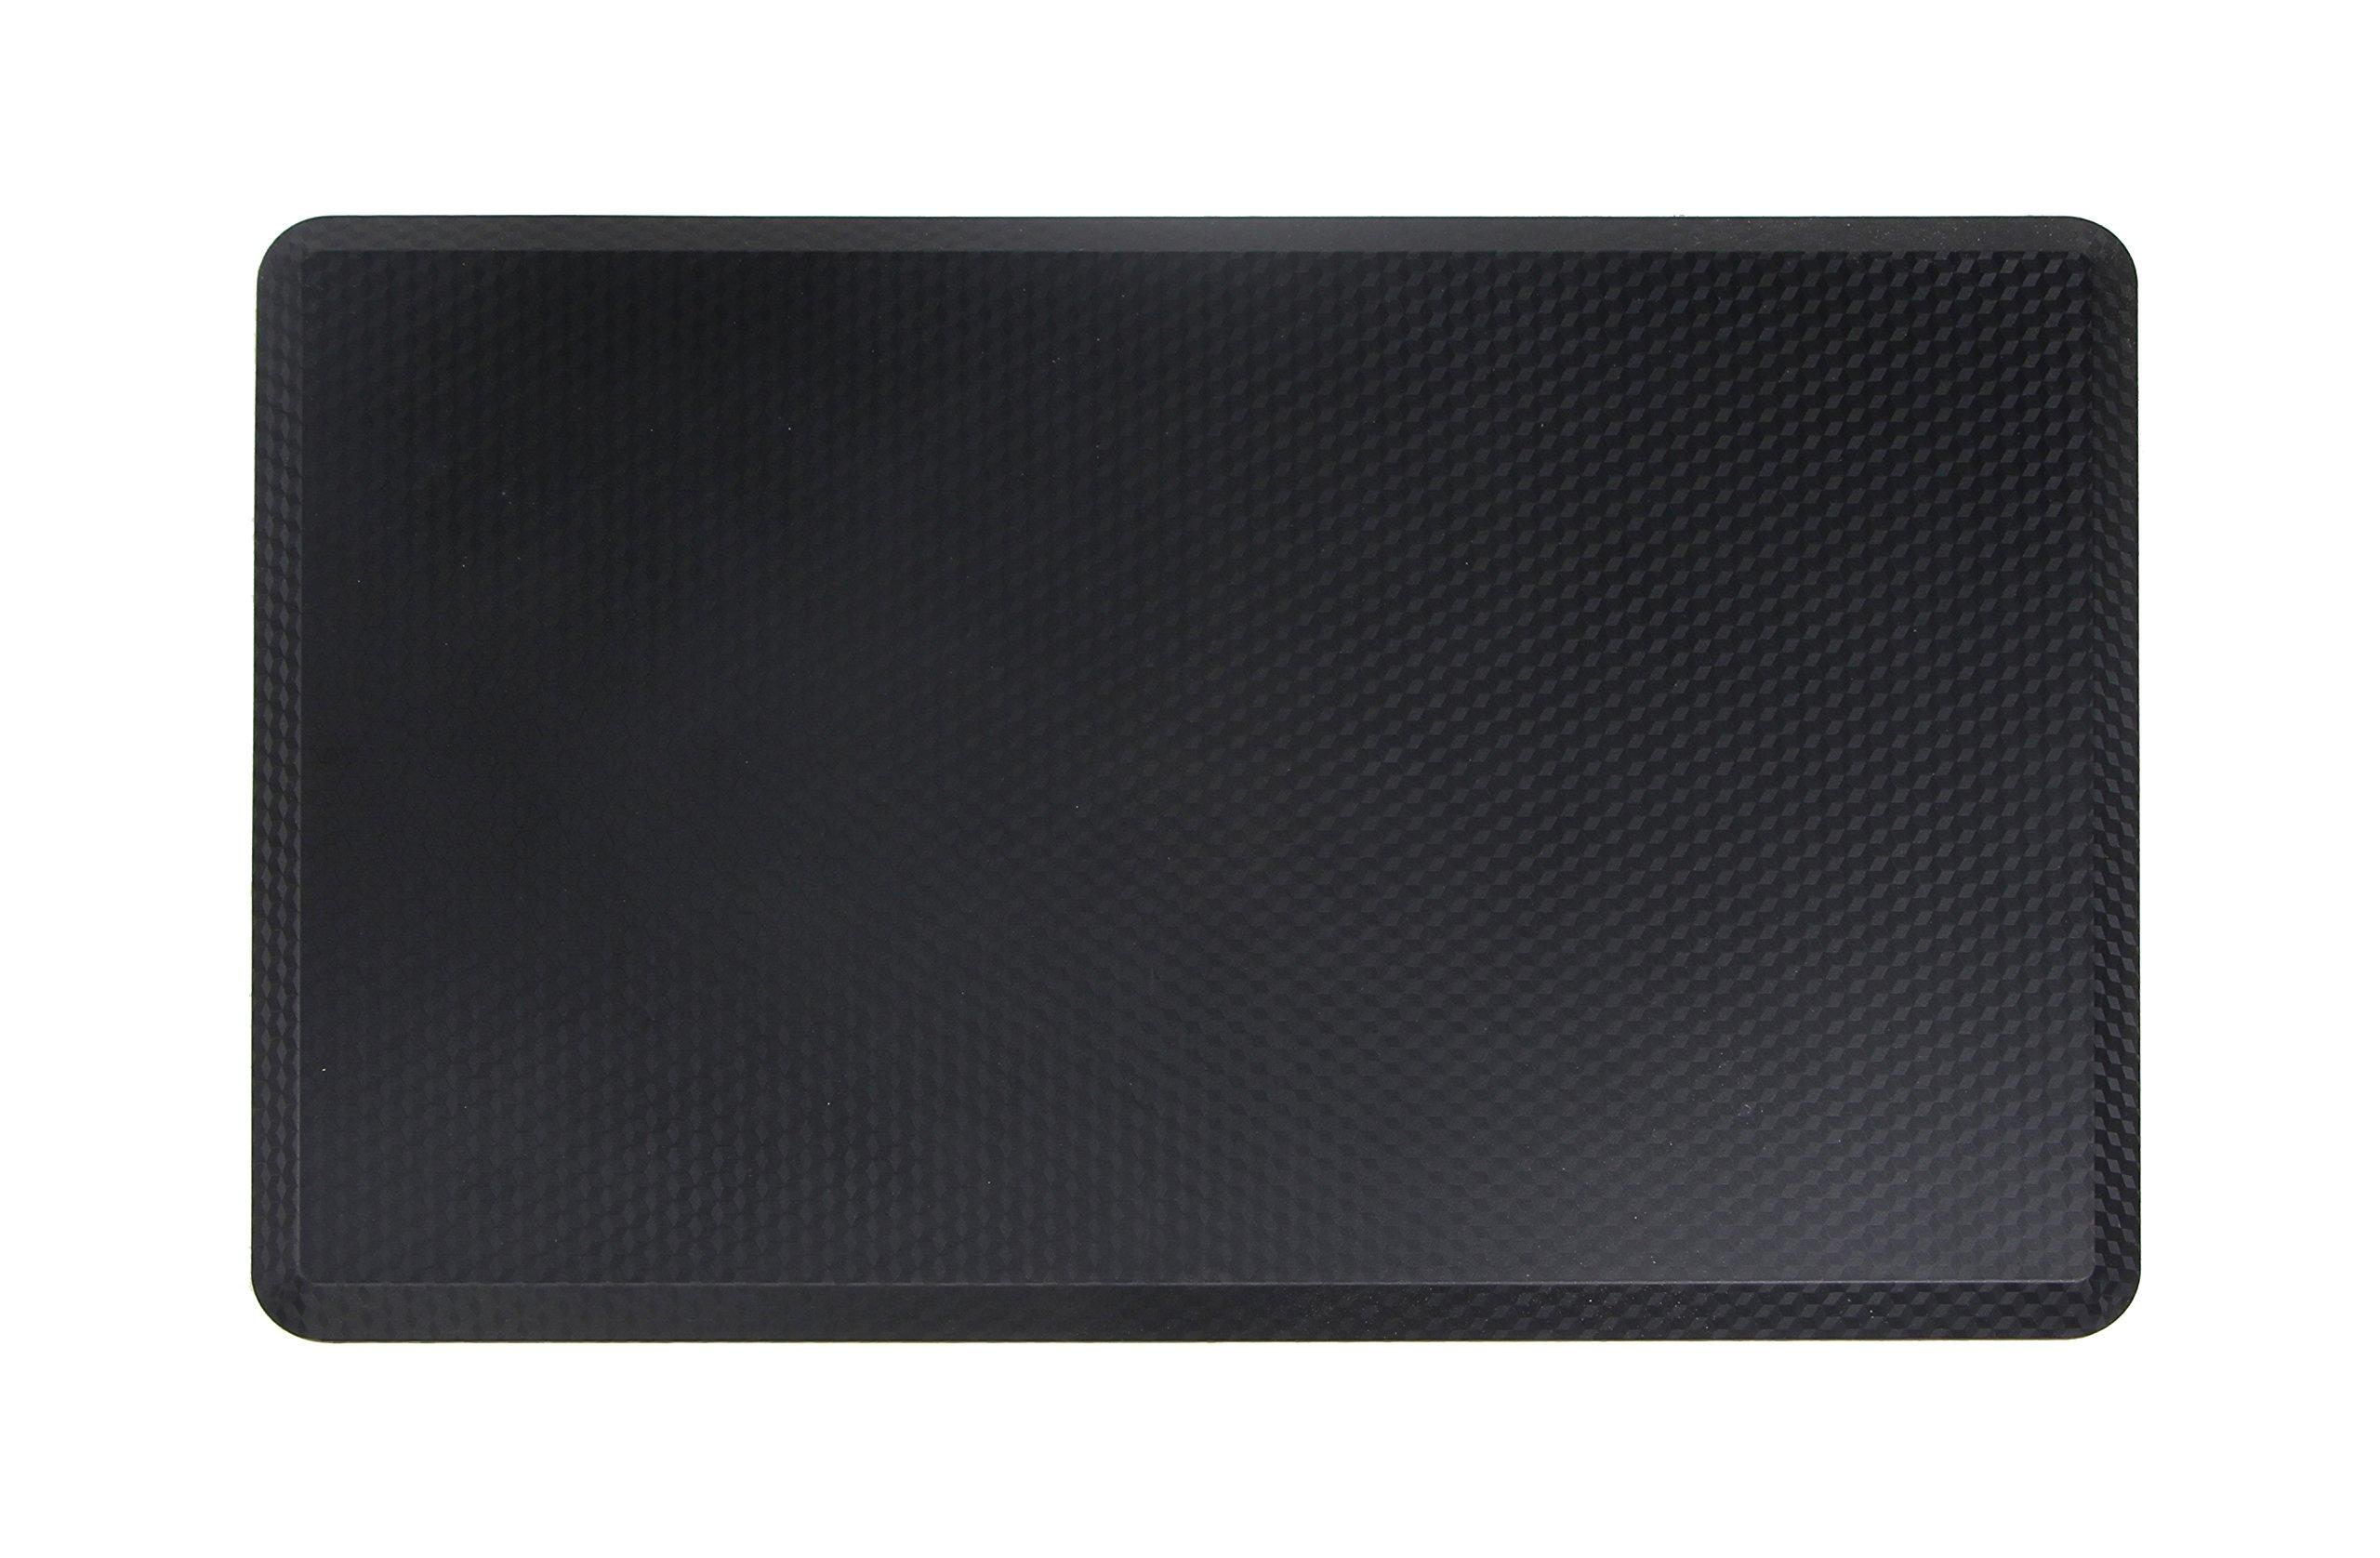 NKV Premium Anti-fatigue Comfort Floor Mat 30'' x 19'' x 3/4'' for Kitchen, Office, Standing Desks and Garages - Black